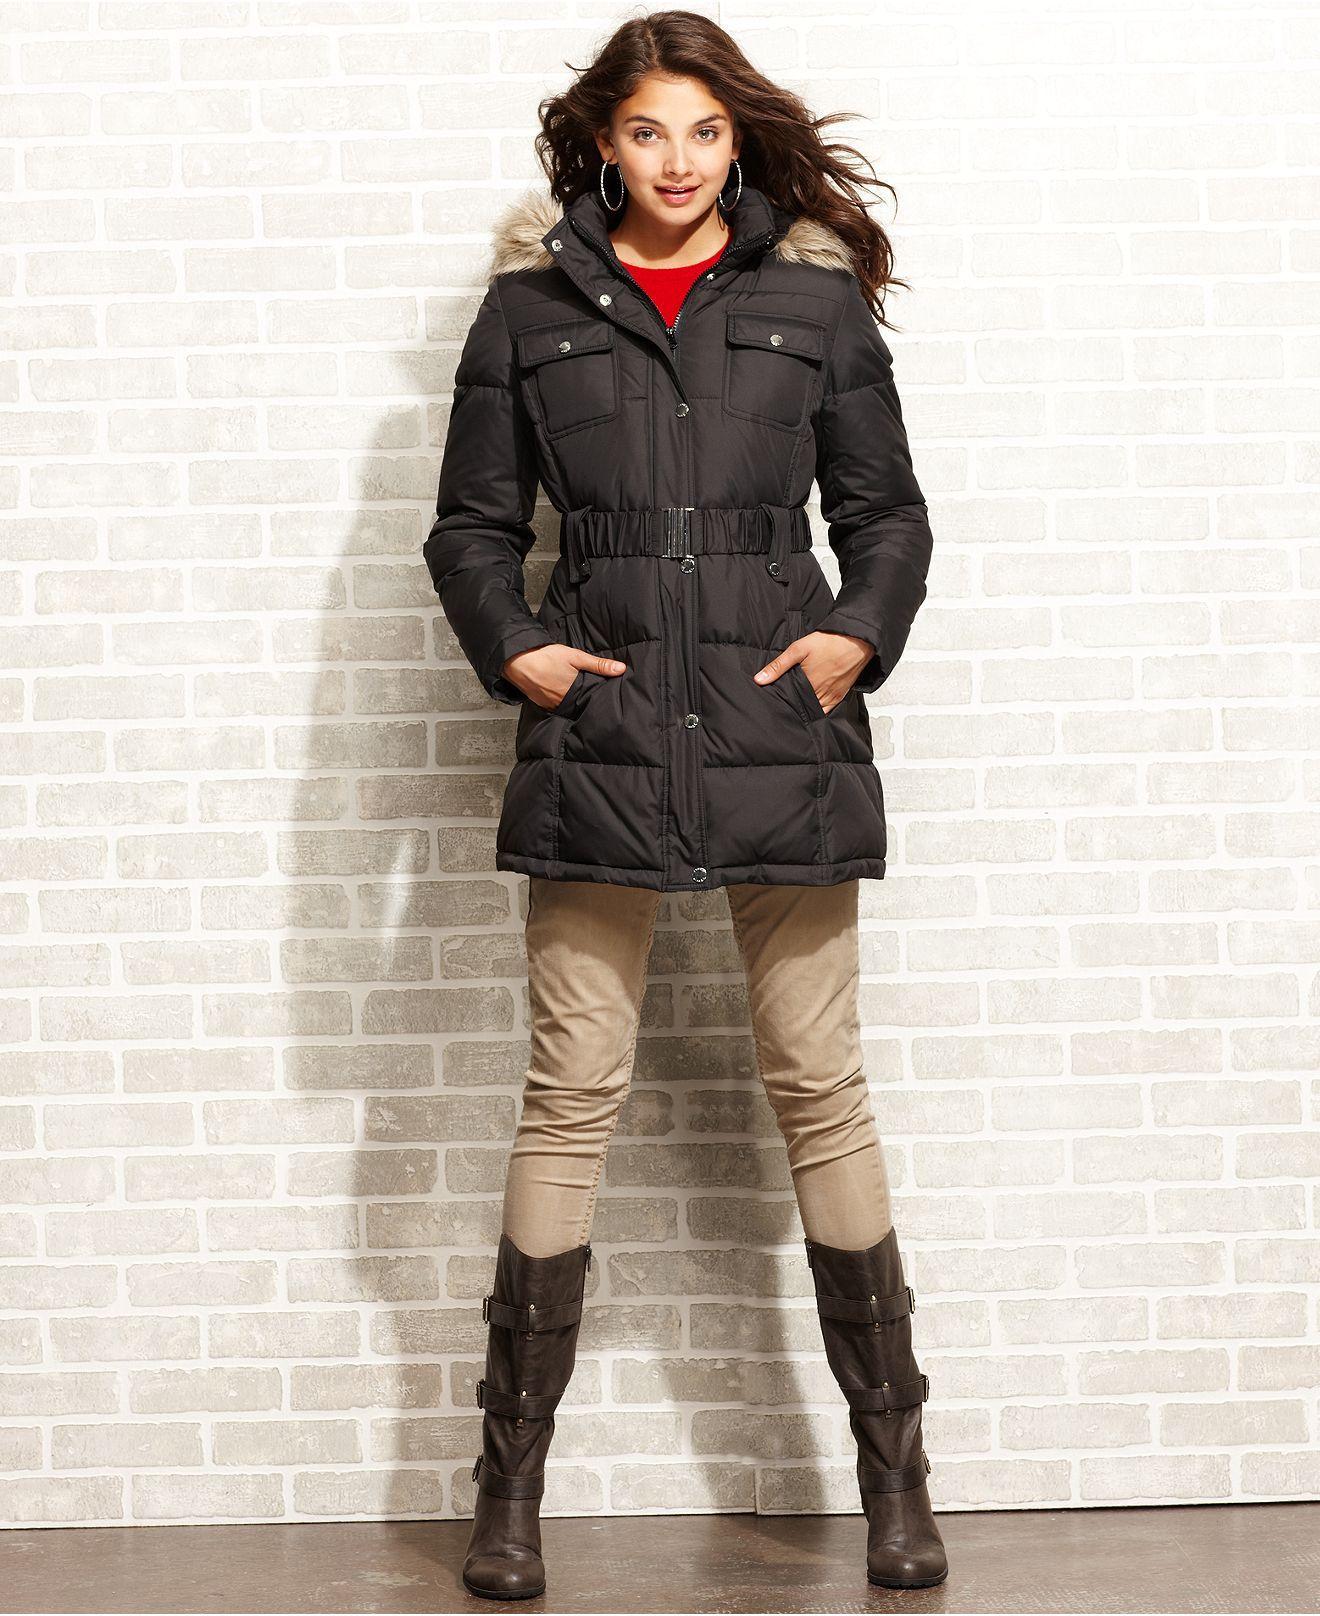 Esprit Coat Hooded Puffer Quilted Parka Womens Coats Macy S Quilted Parka Womens Parka Coats For Women [ 1616 x 1320 Pixel ]